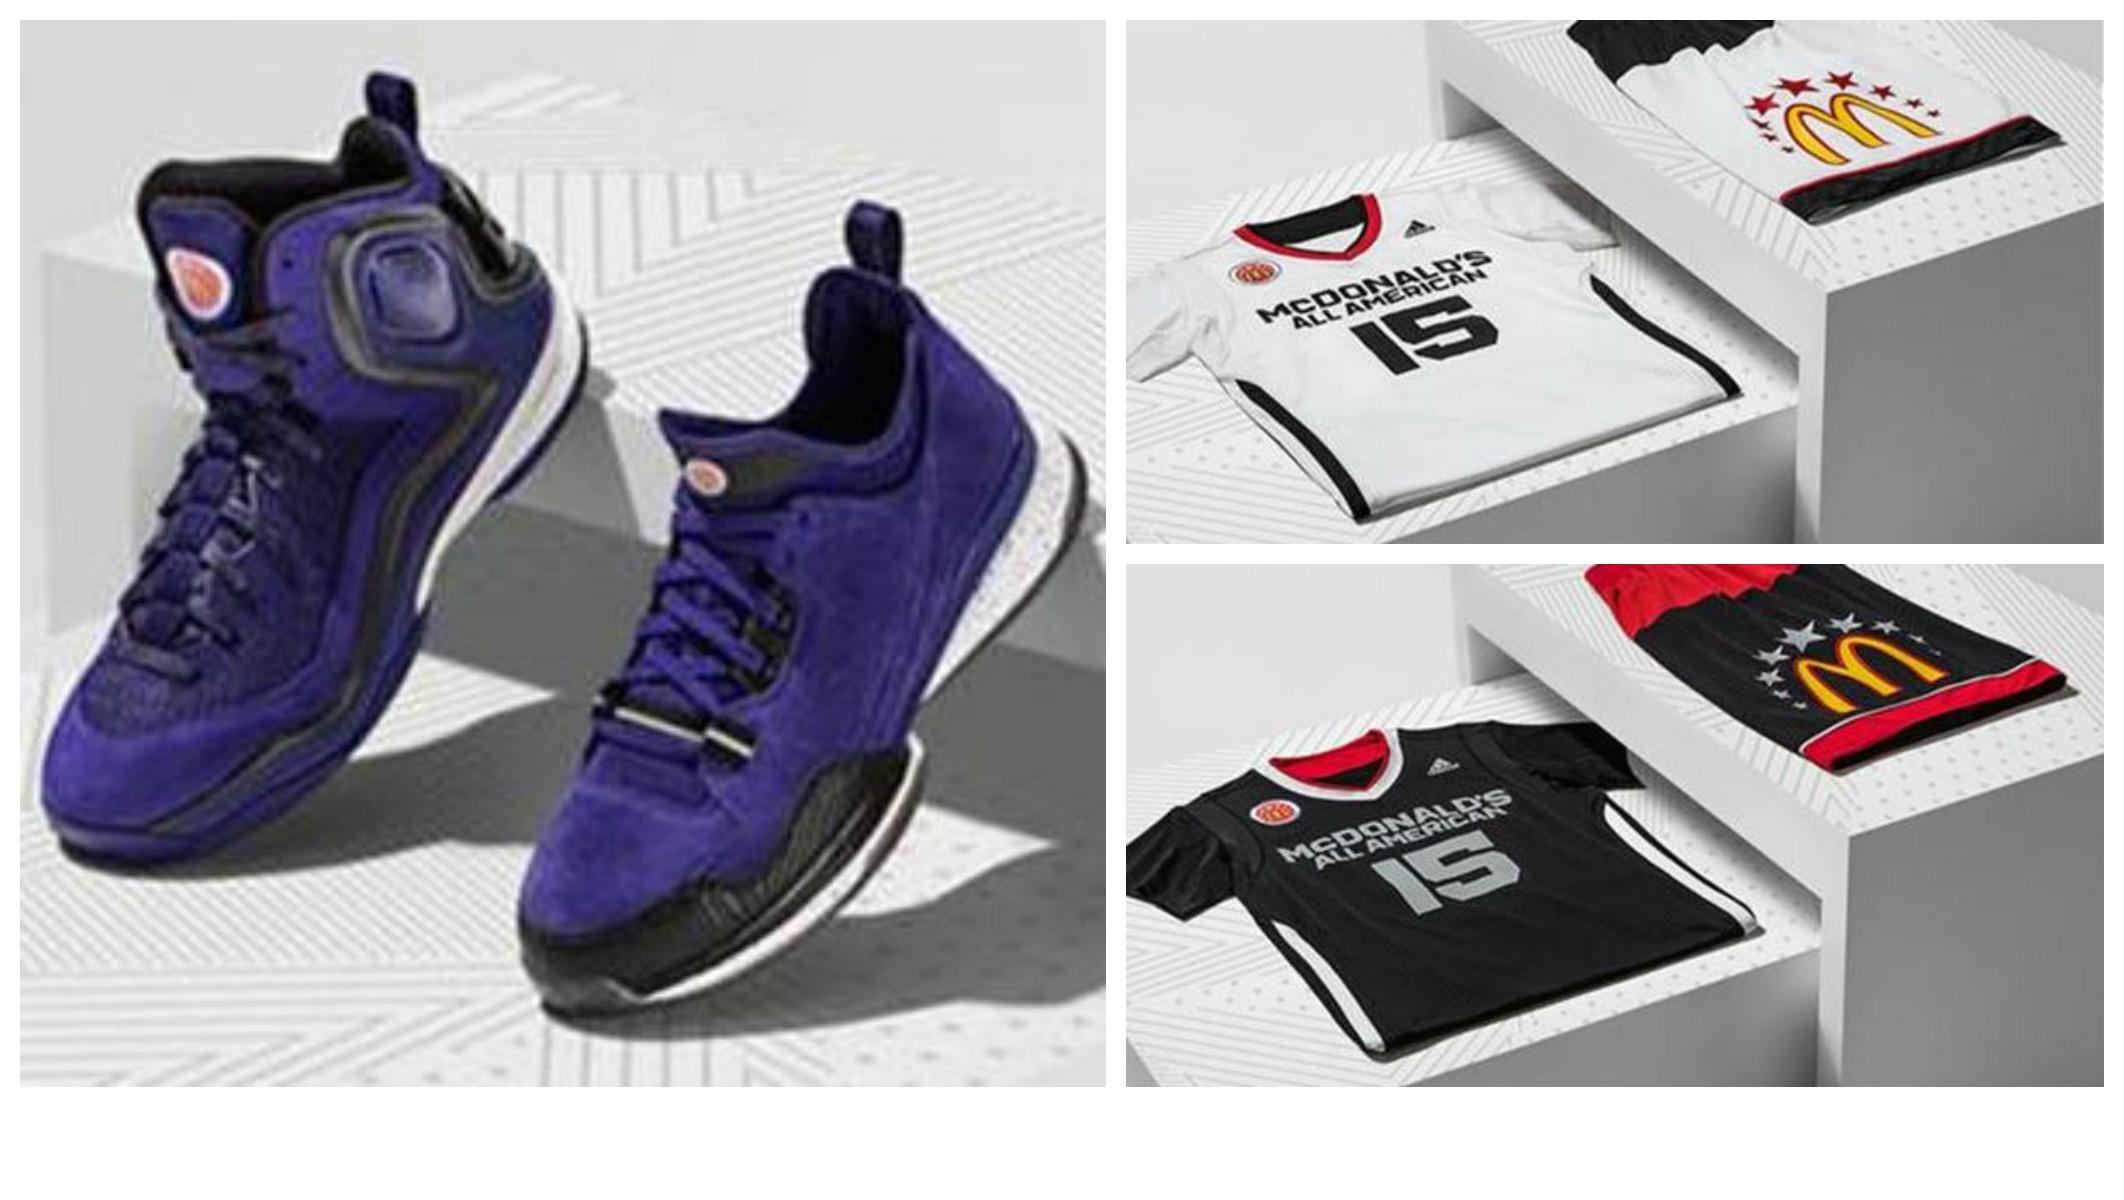 2015 McDonalds All American High School Basketball Games Uniform and Footwear